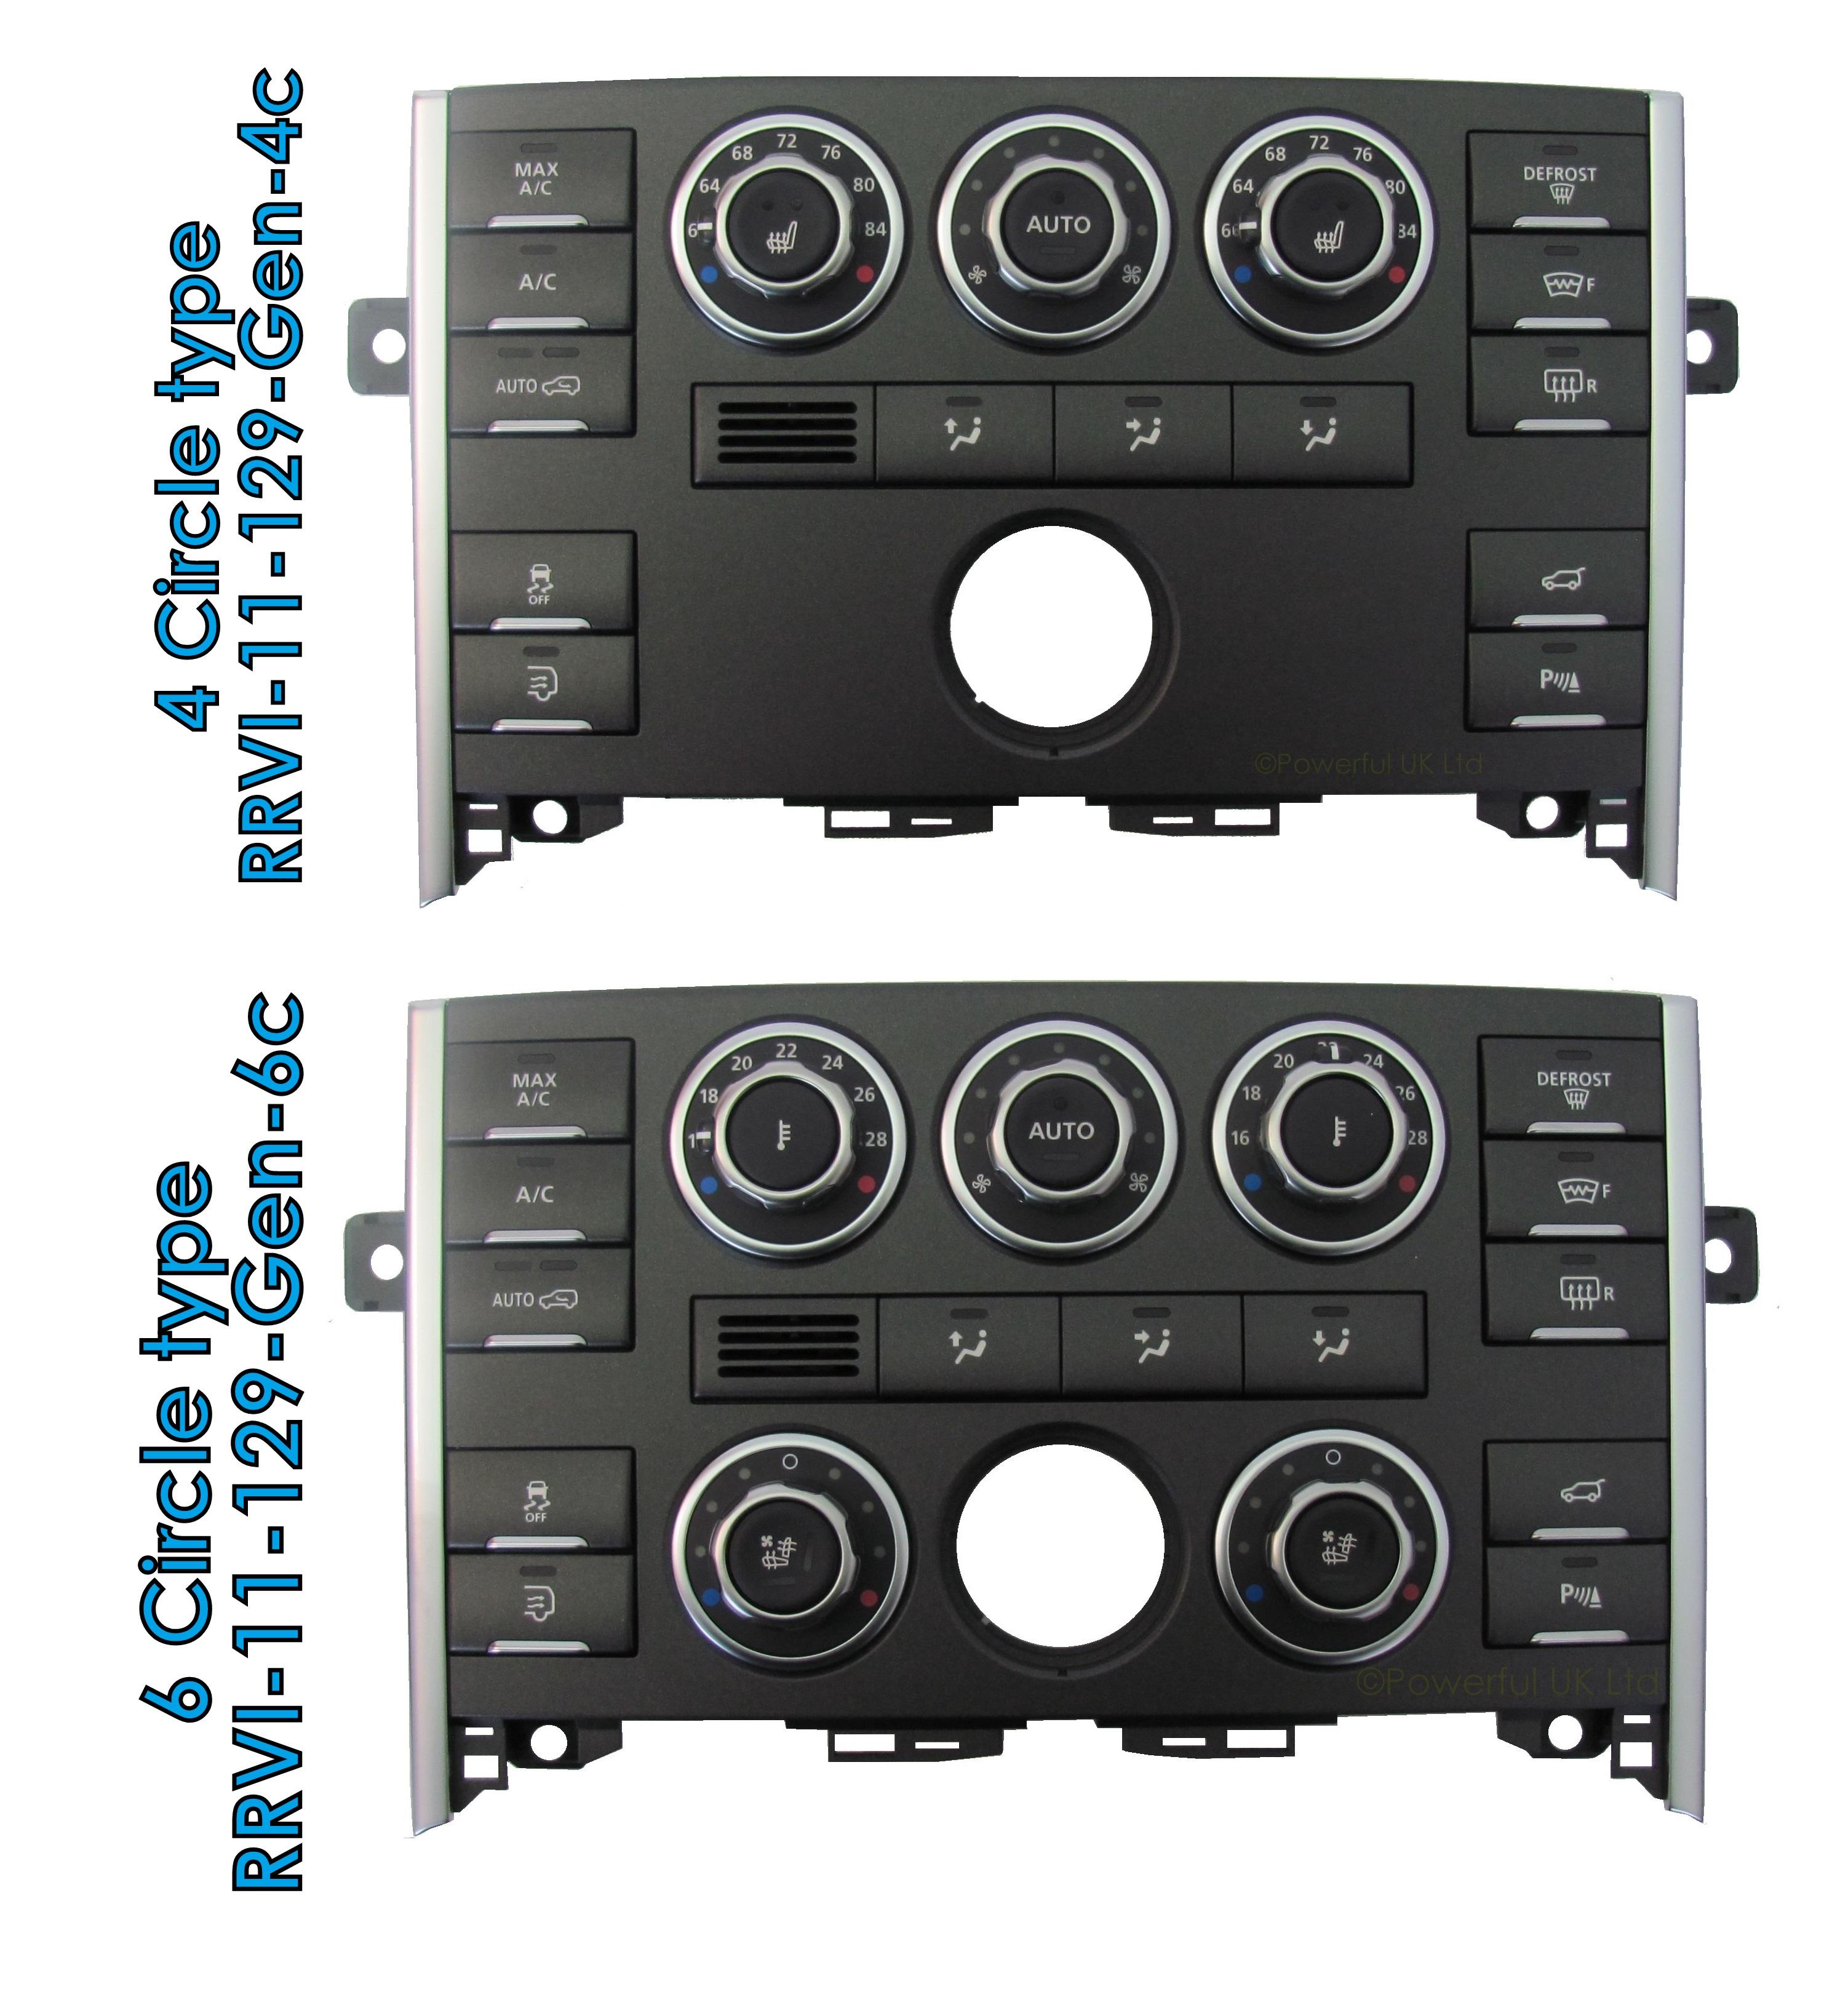 2002 Land Rover Range Rover Interior: Clock Dash Panel Fascia RangeRover L322 2010-12 Interior